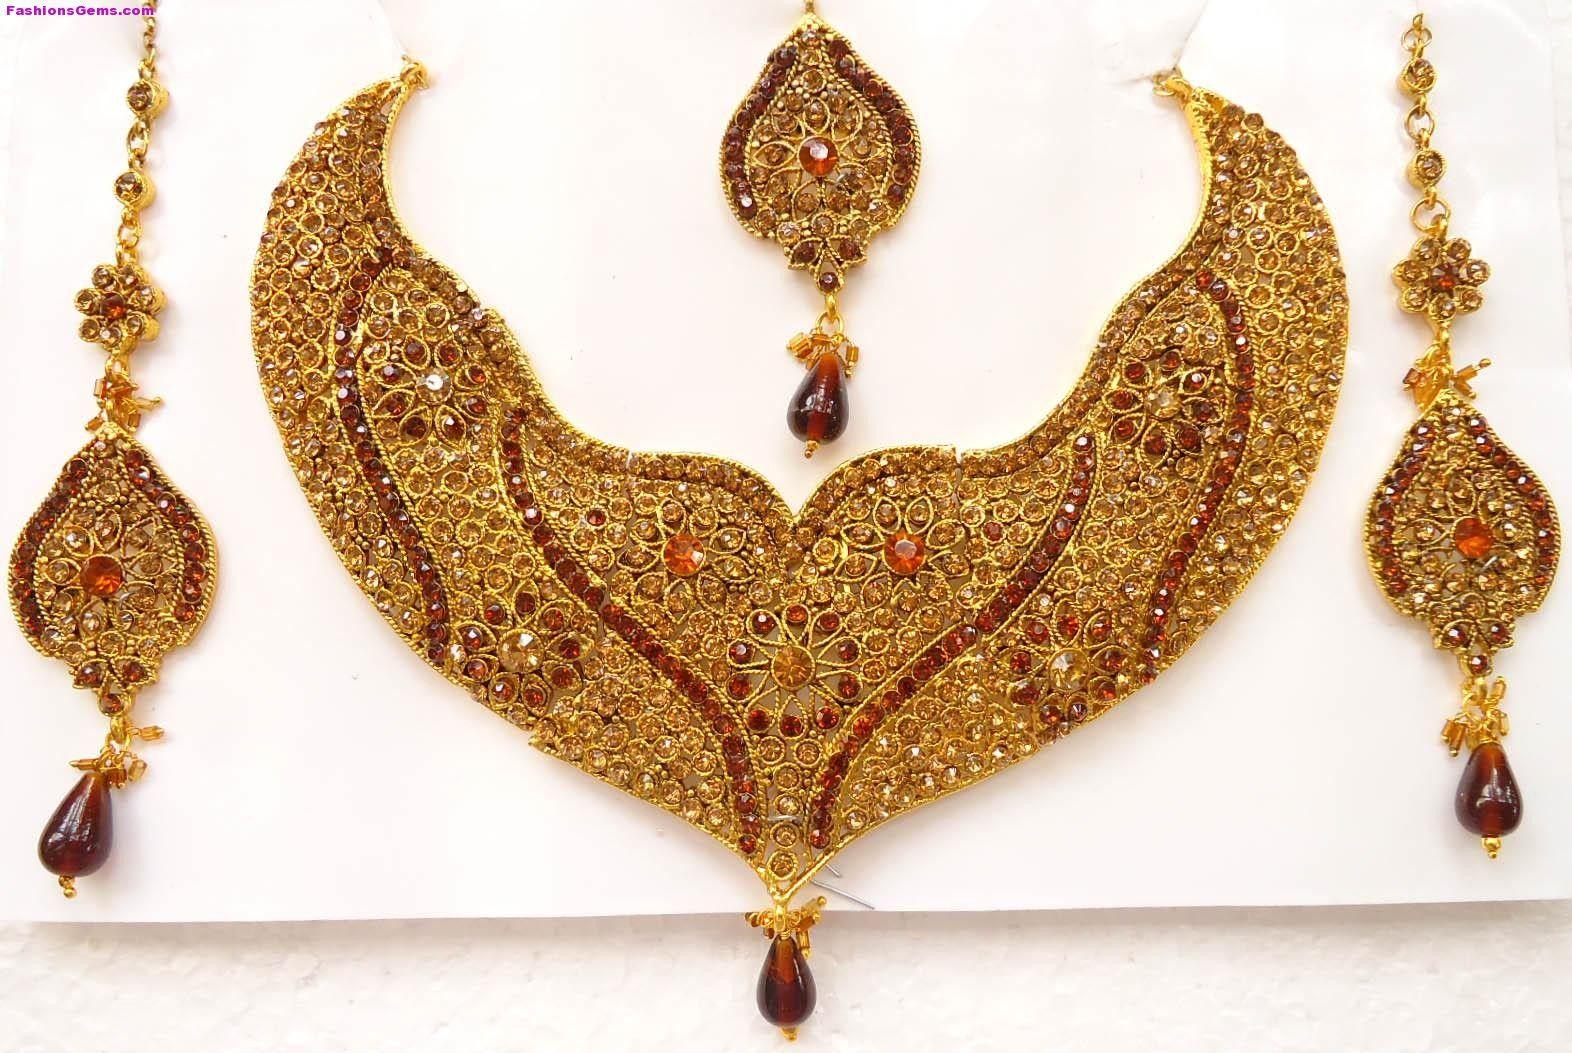 Gold Necklaces Designs in Dubai | Bridal-Jewellery-Sets-Designs ...